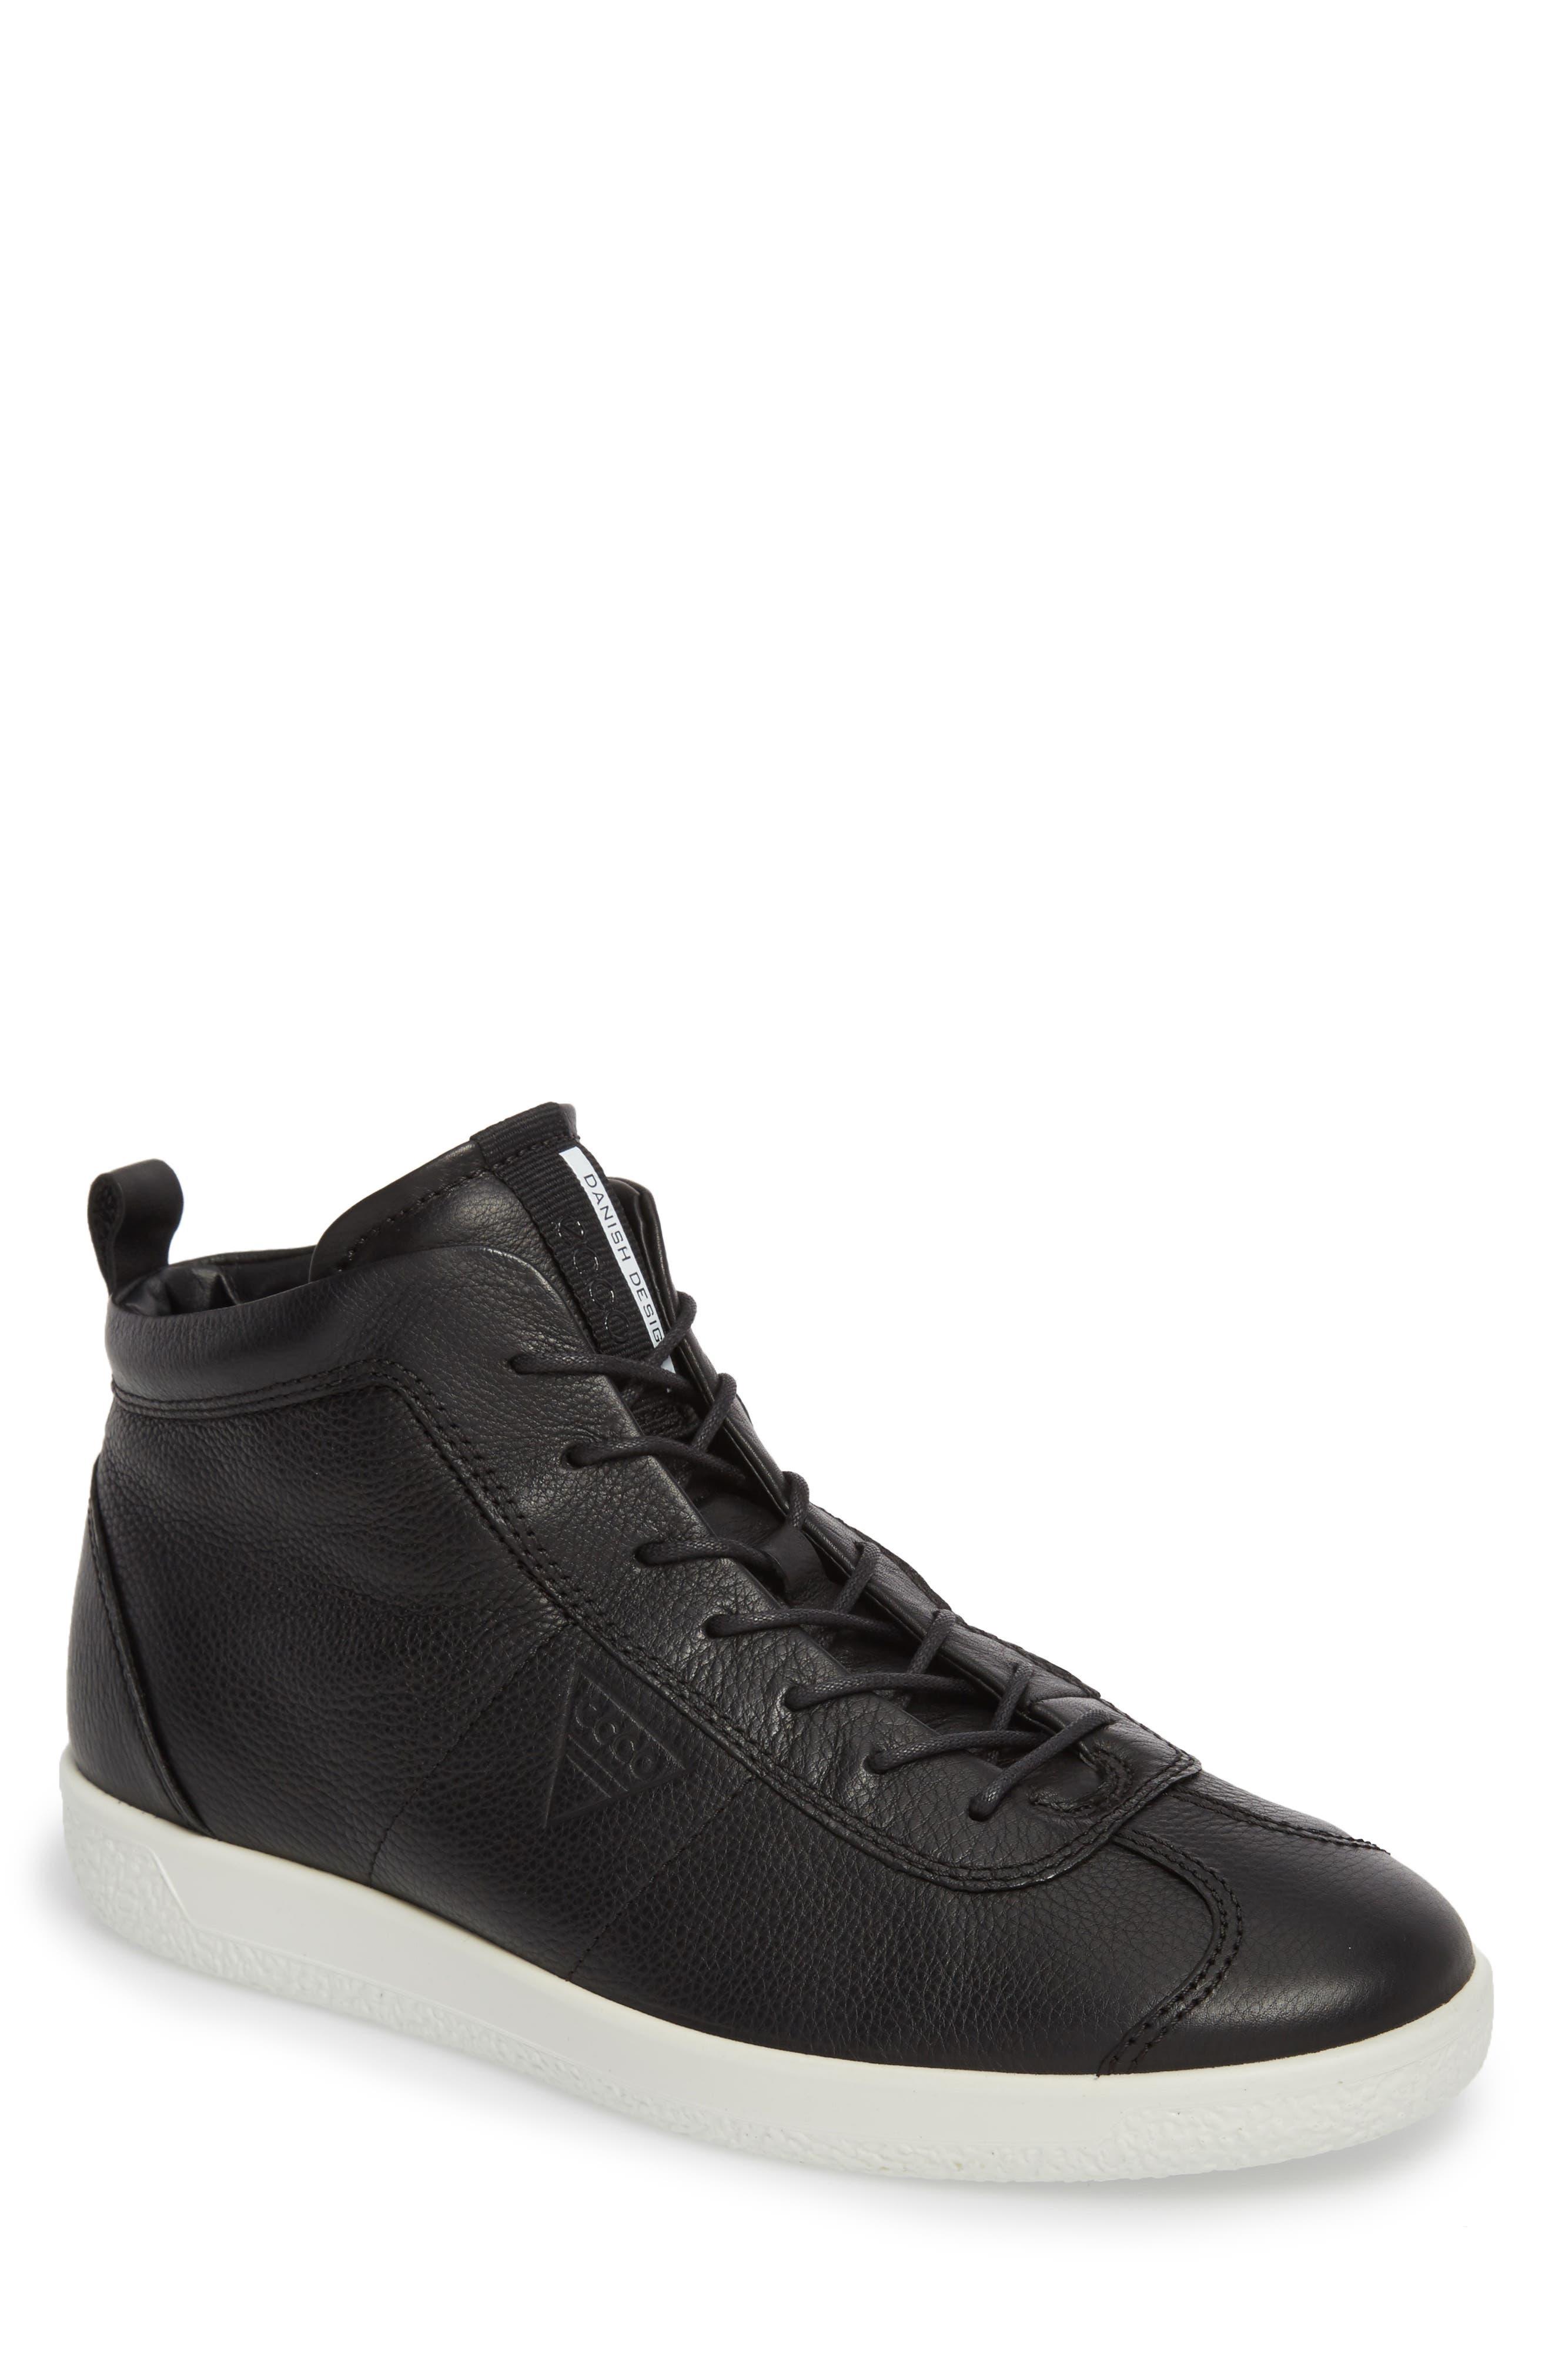 Soft 1 High Top Sneaker,                             Main thumbnail 1, color,                             Black Nubuck